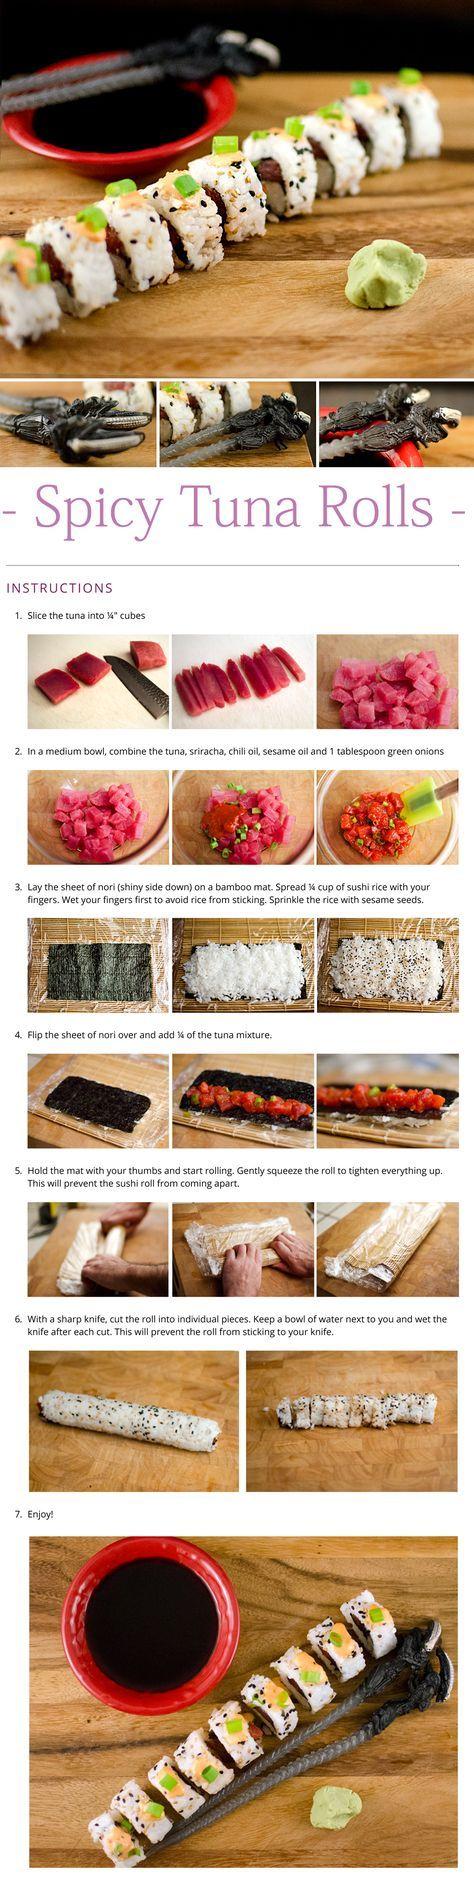 How to make Spicy Tuna Rolls. http://www.astroeater.com/spicy-tuna-roll-recipe/